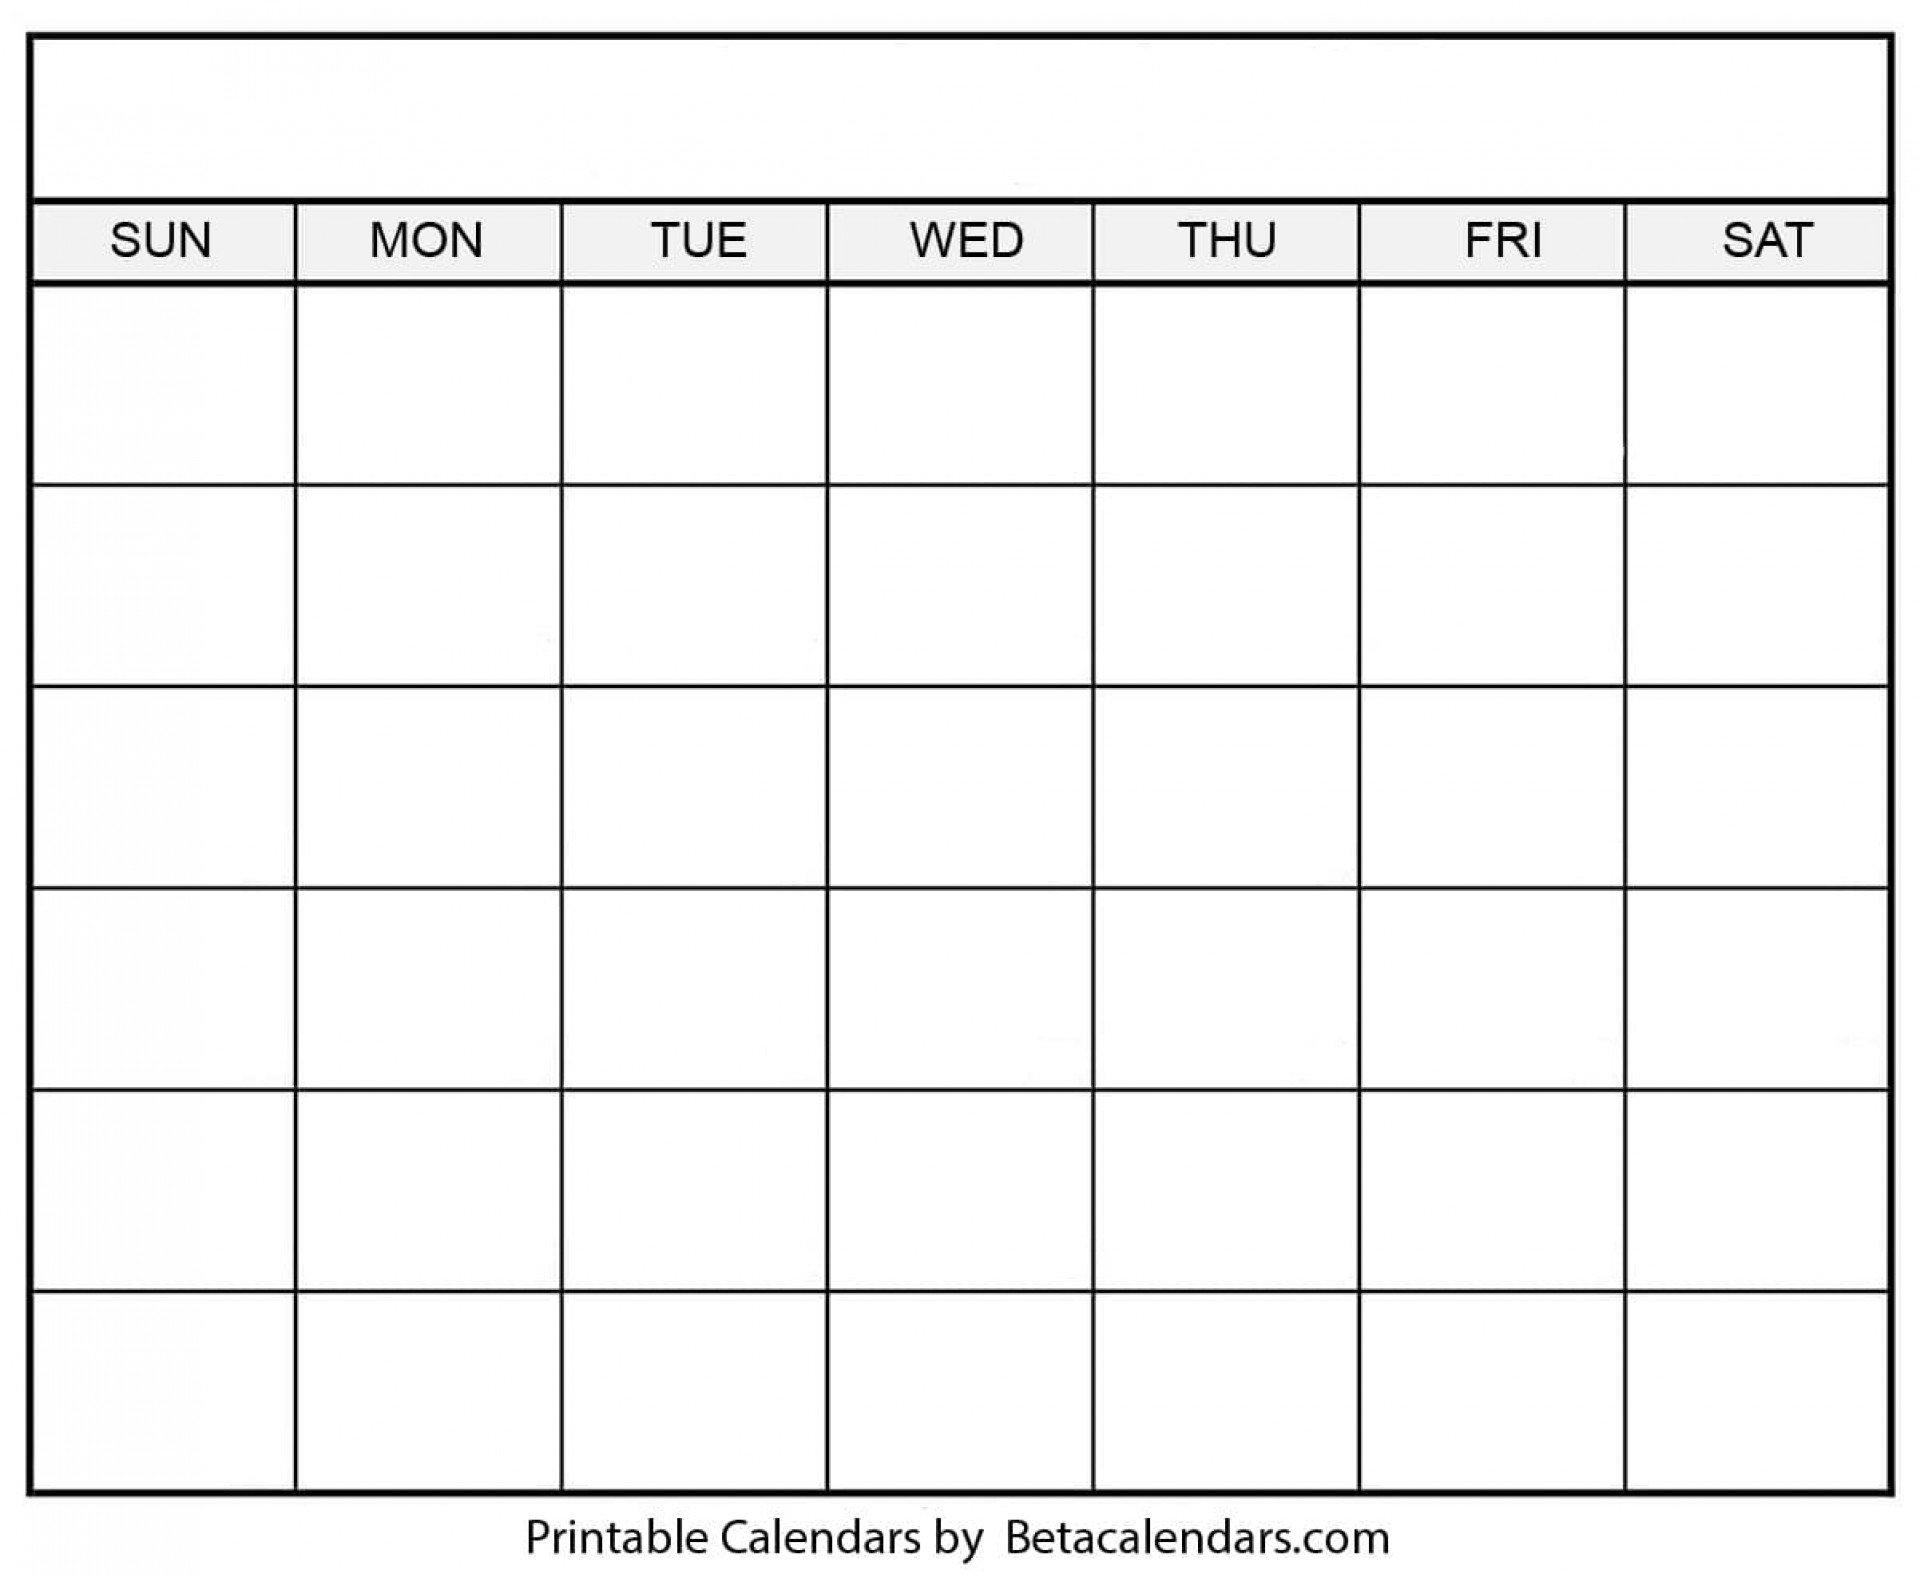 005 Incredible 30 Day Calendar Template Example ~ Addictionary 30 Day Blank Printable